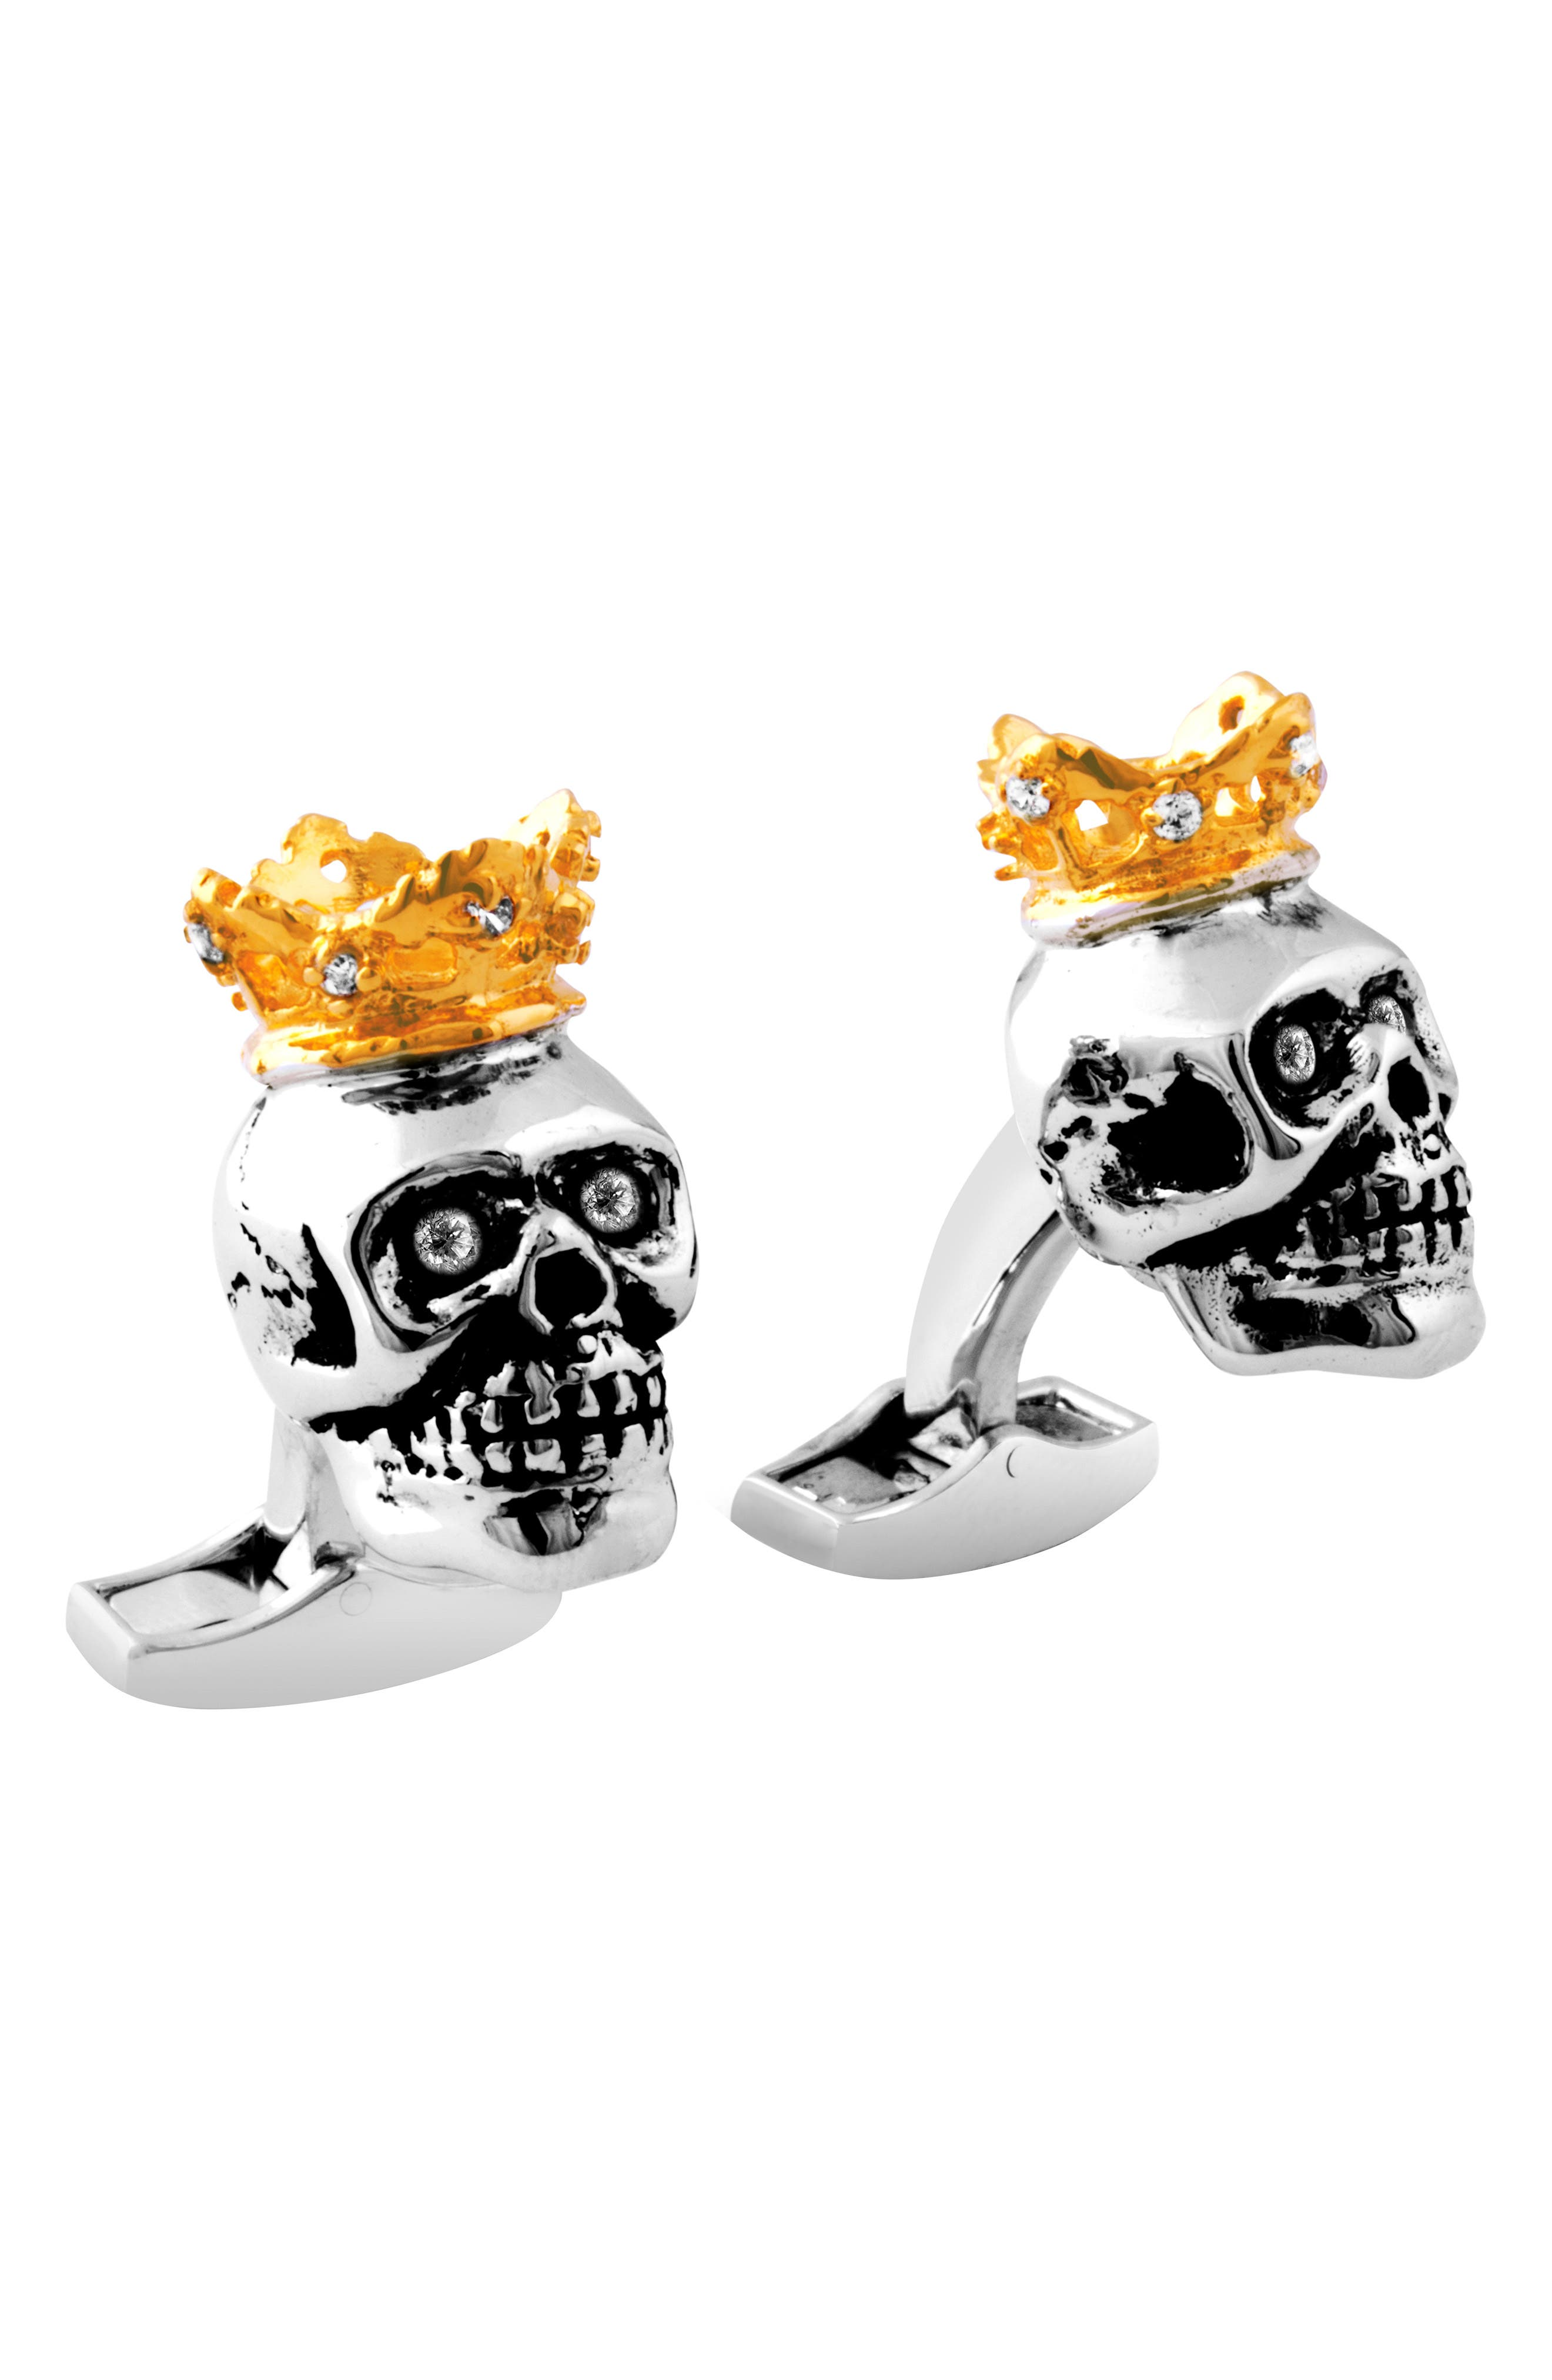 King Skull Cuff Links,                         Main,                         color, BLACK